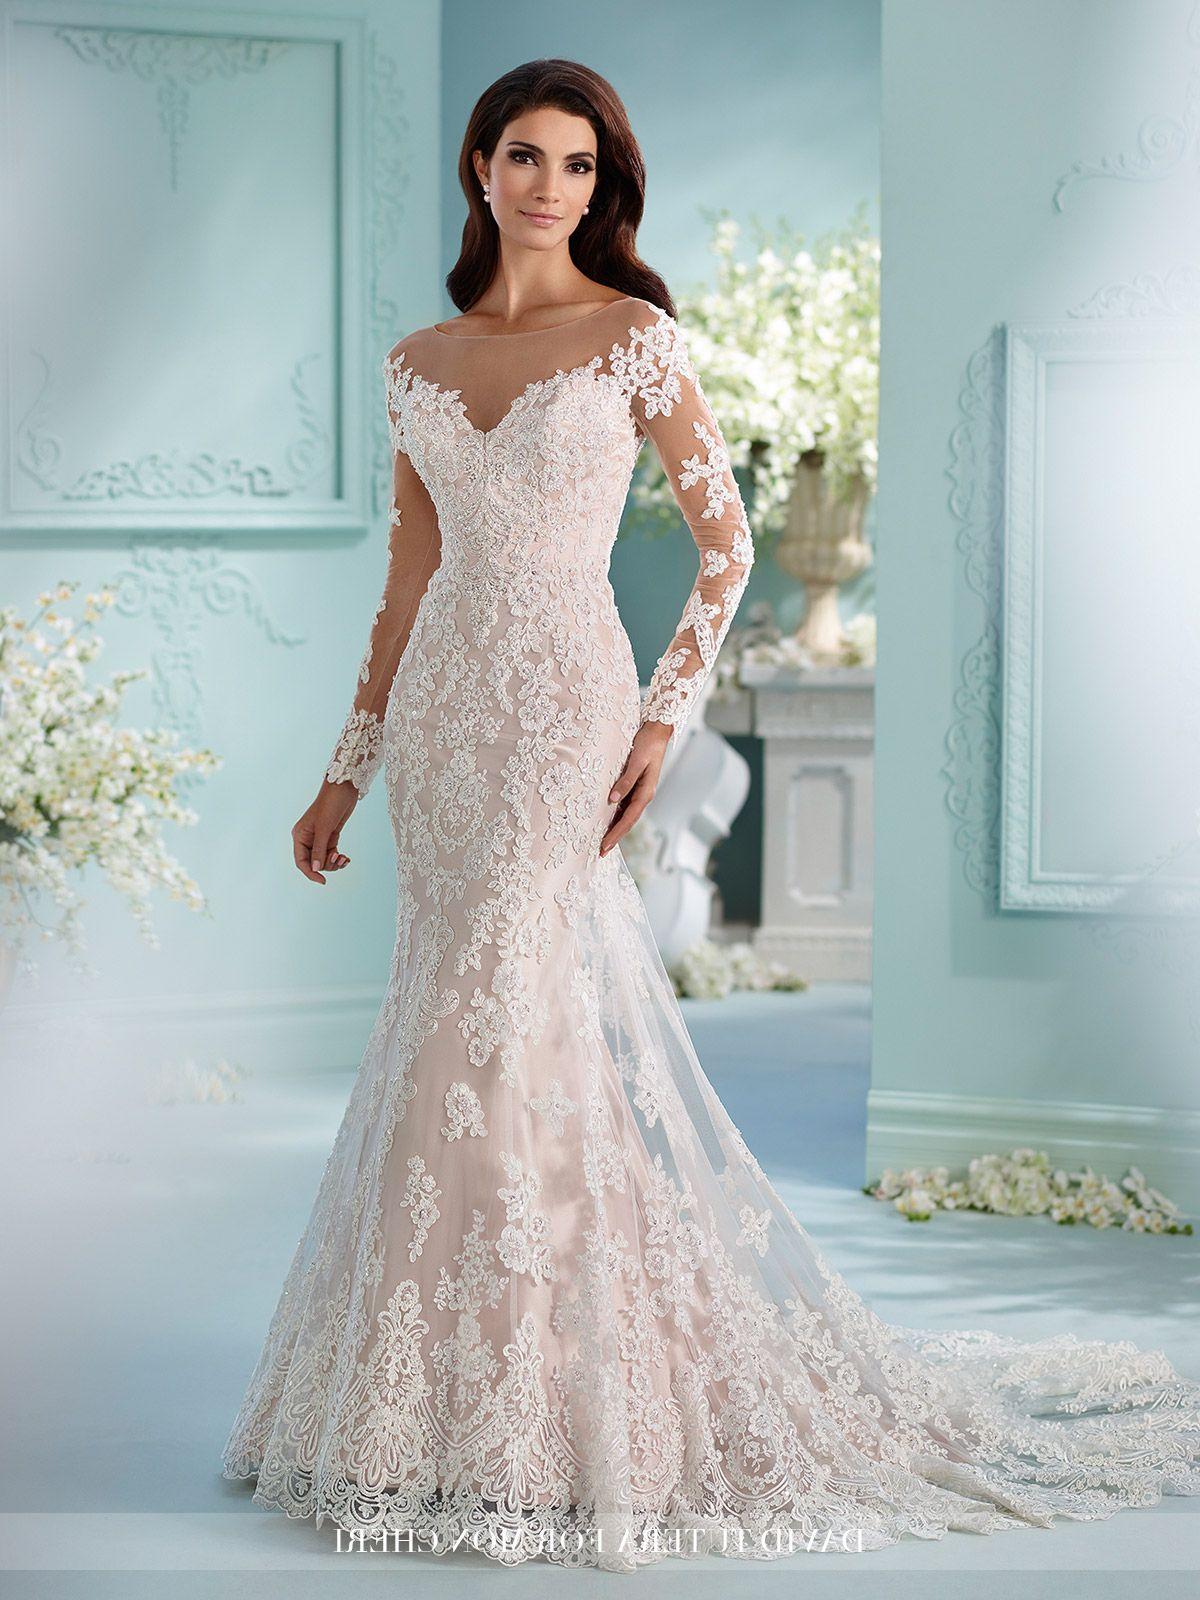 Long Sleeve Wedding Dresses Ottawa Longsleeve Dress Pinterest